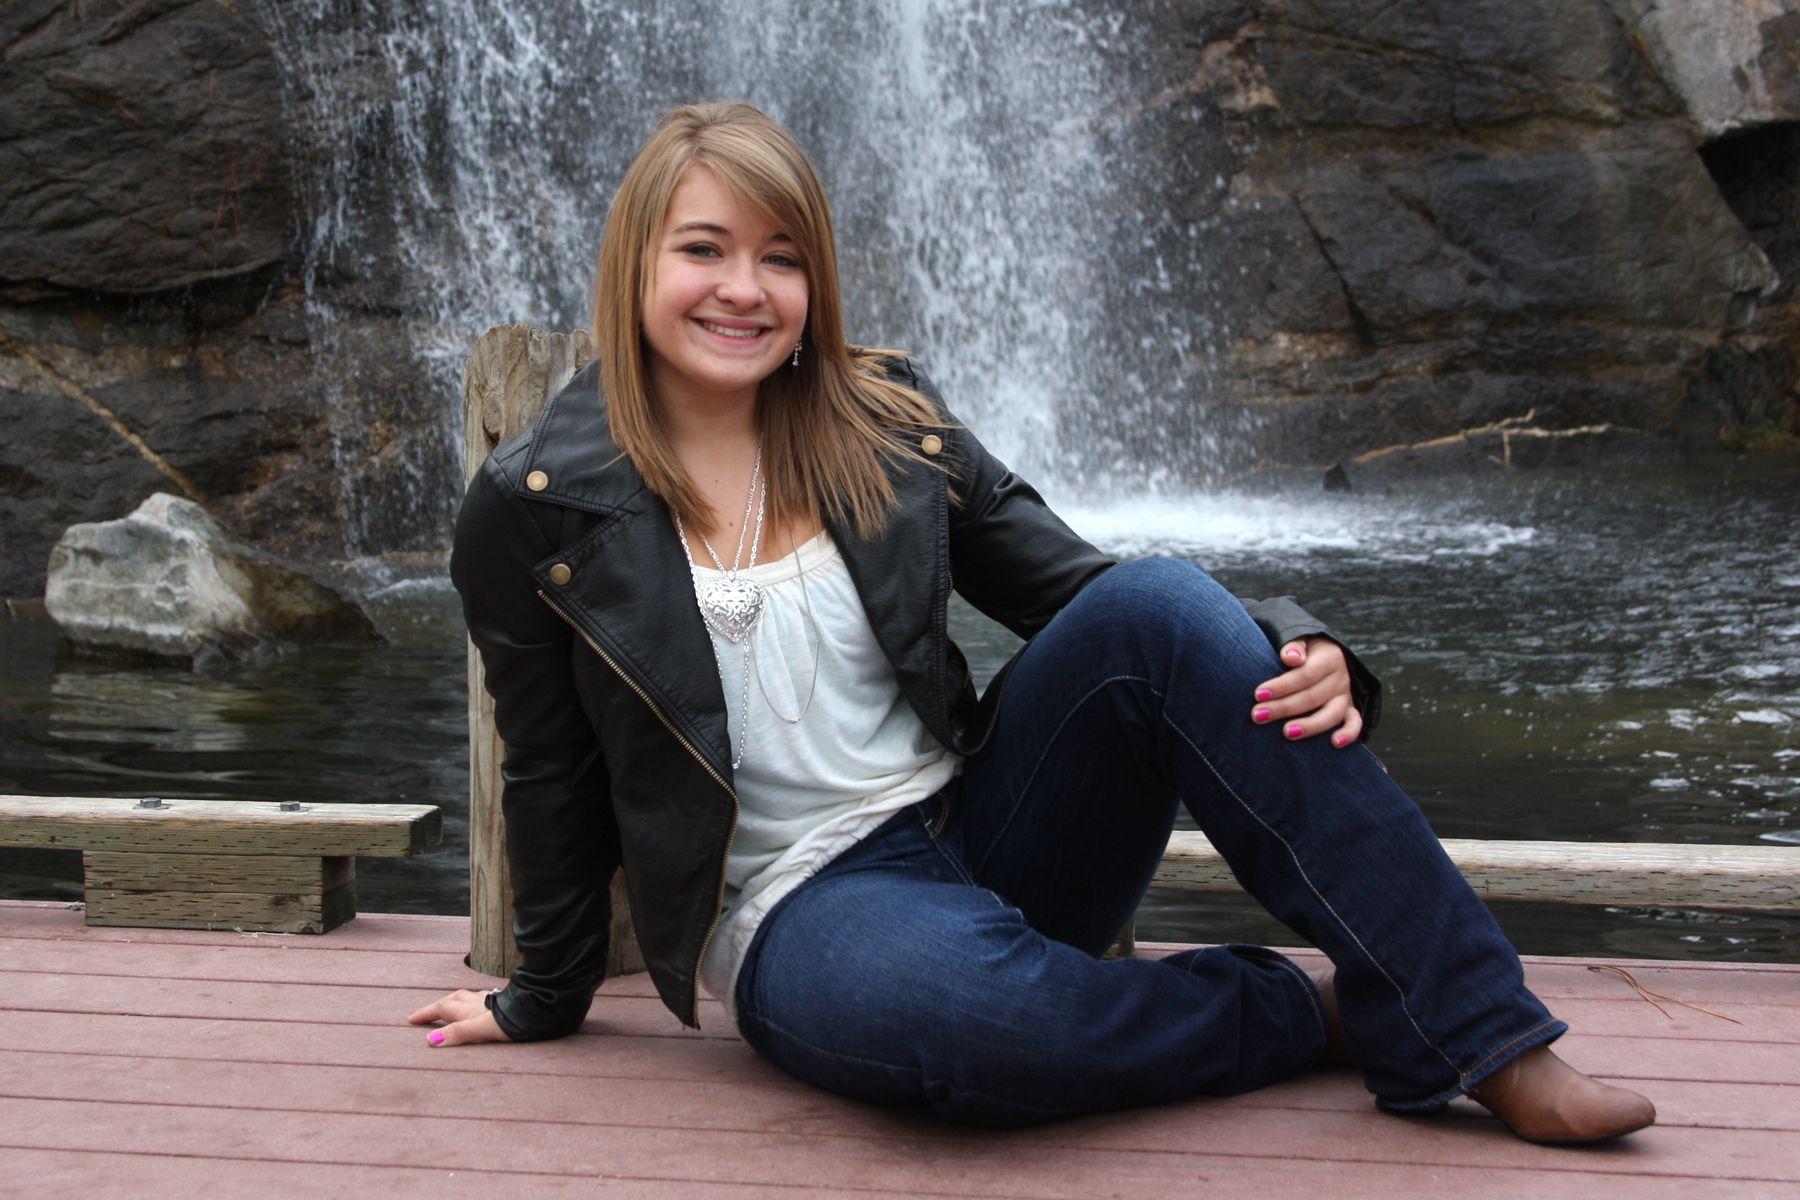 Jessica at Mirabeaux Park